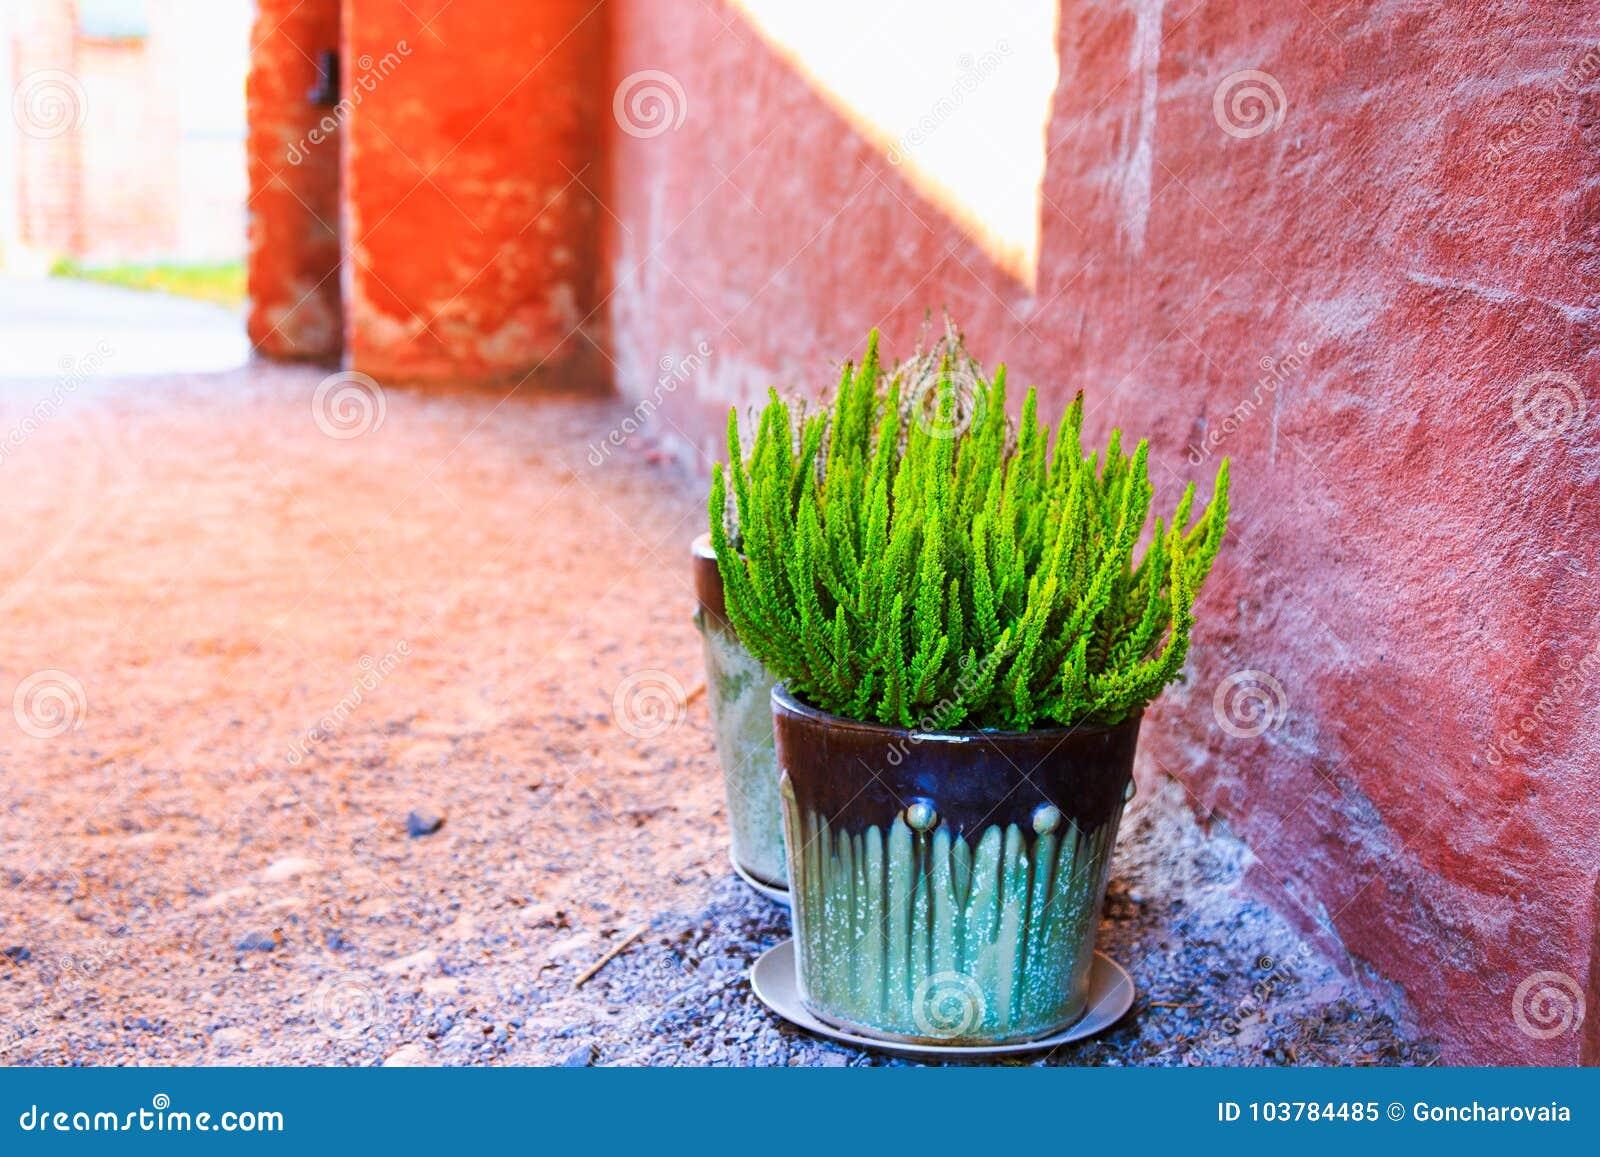 Small Green Plant Heather Calluna Vulgaris In Ceramic Flower